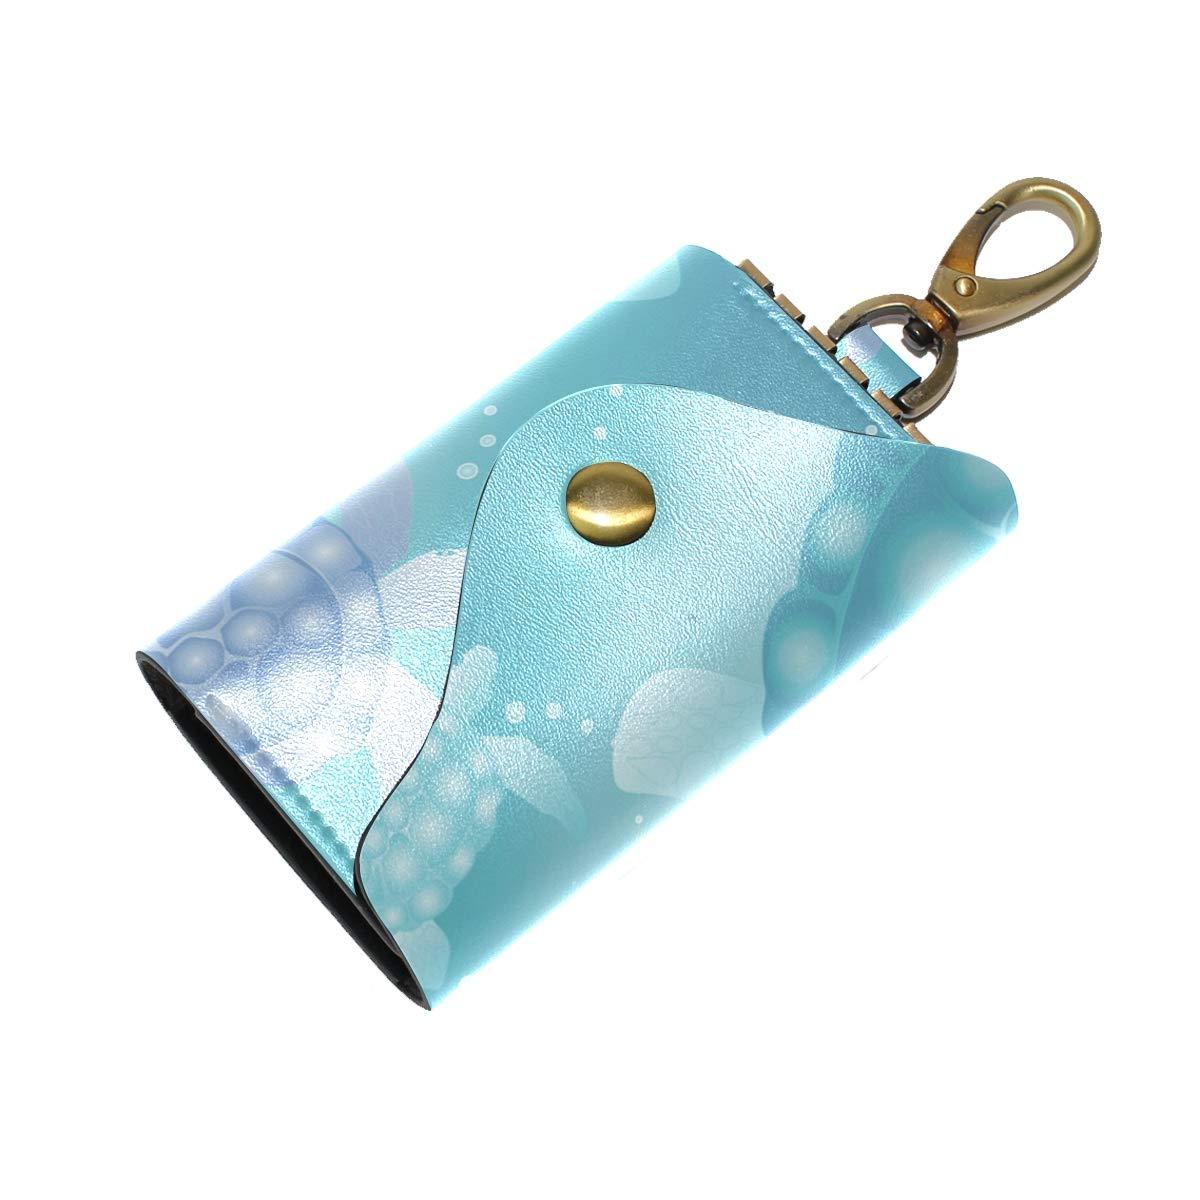 KEAKIA Sea Turtles Leather Key Case Wallets Tri-fold Key Holder Keychains with 6 Hooks 2 Slot Snap Closure for Men Women